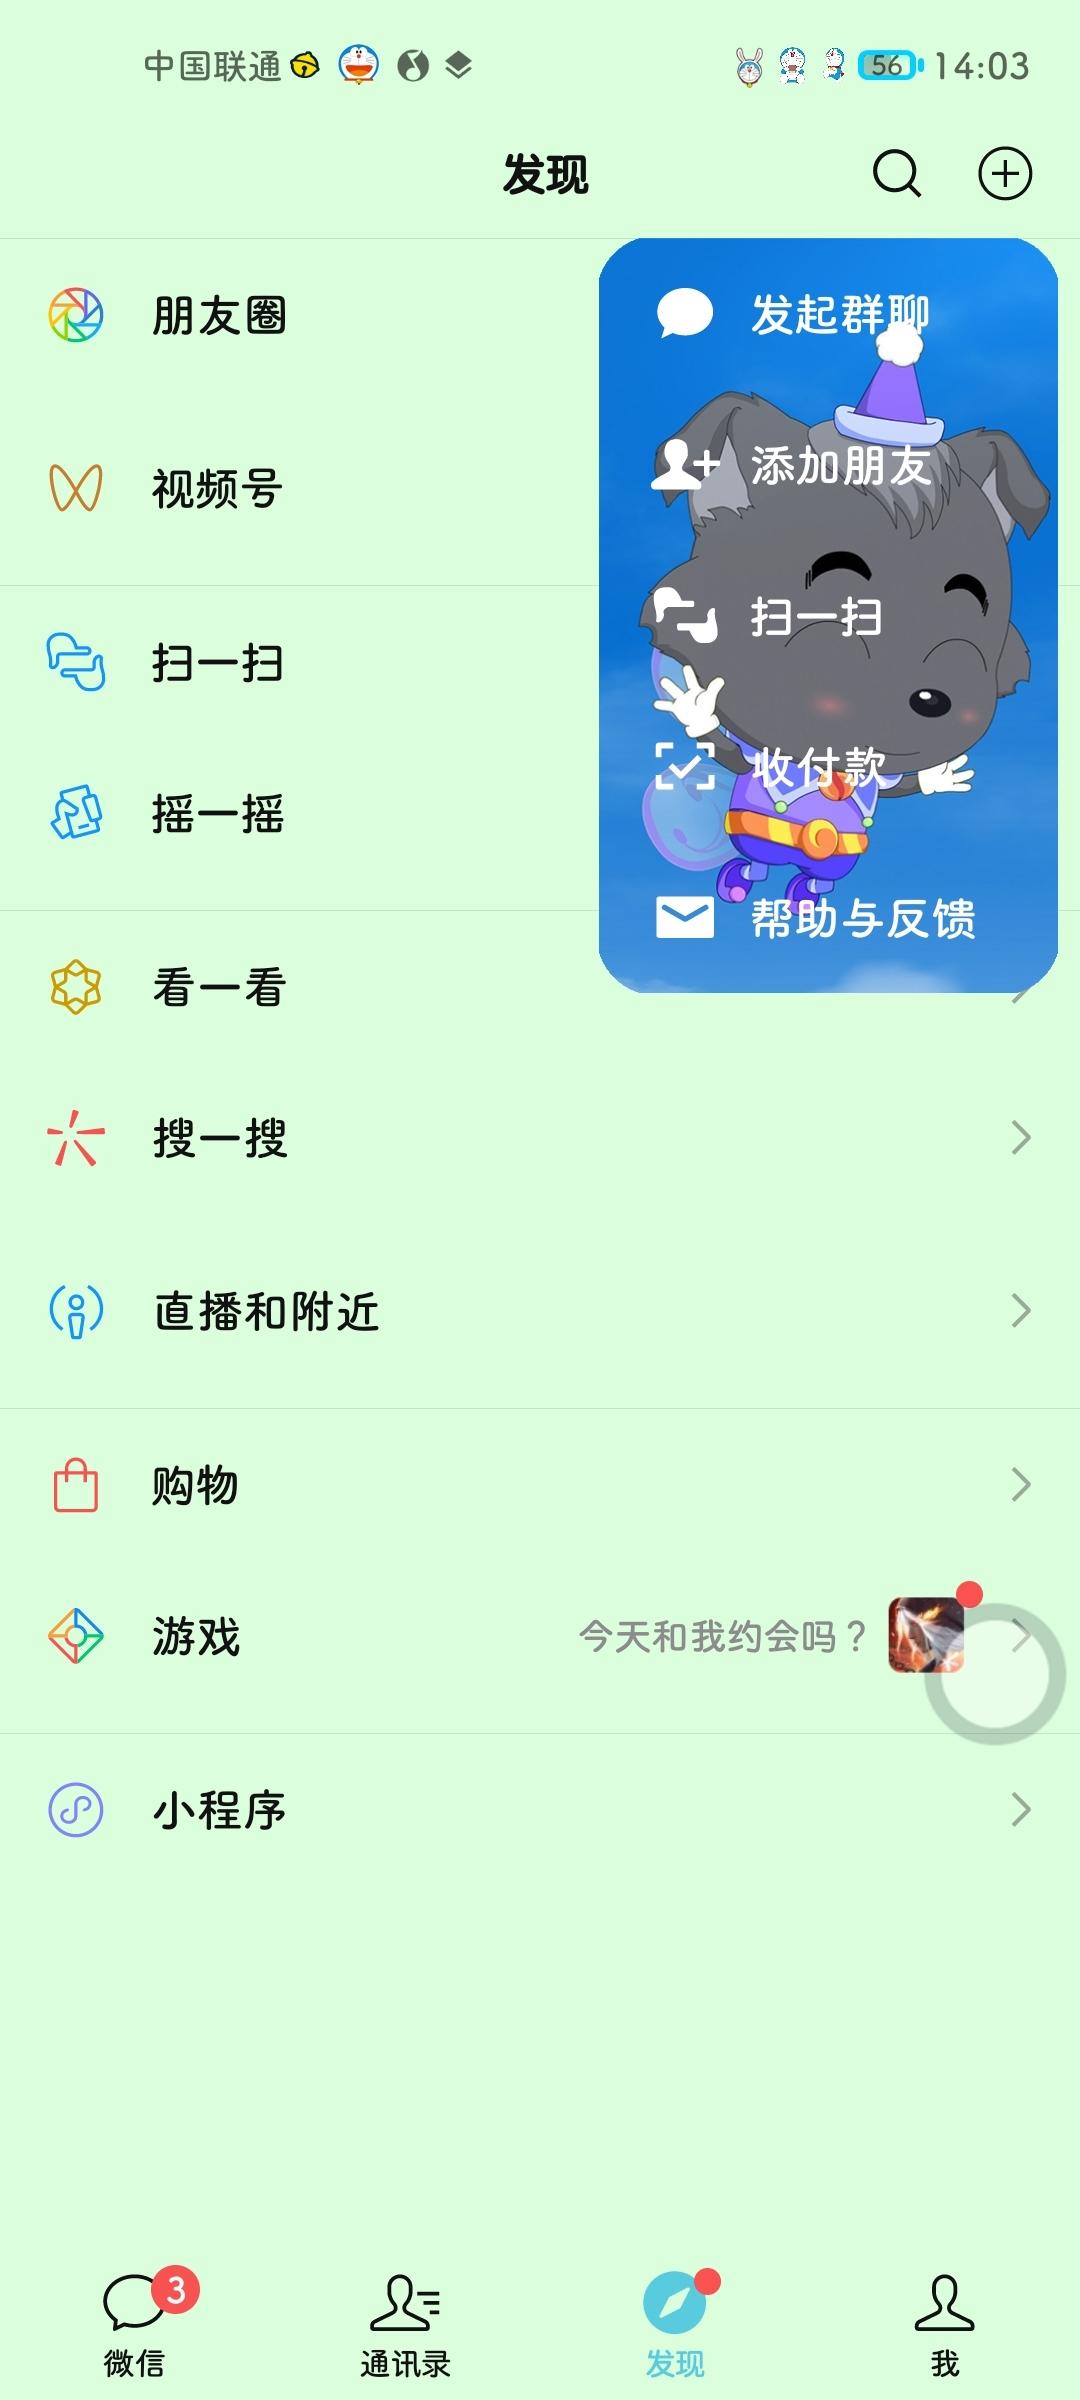 Screenshot_20210501_140301_com.tencent.mm.jpg